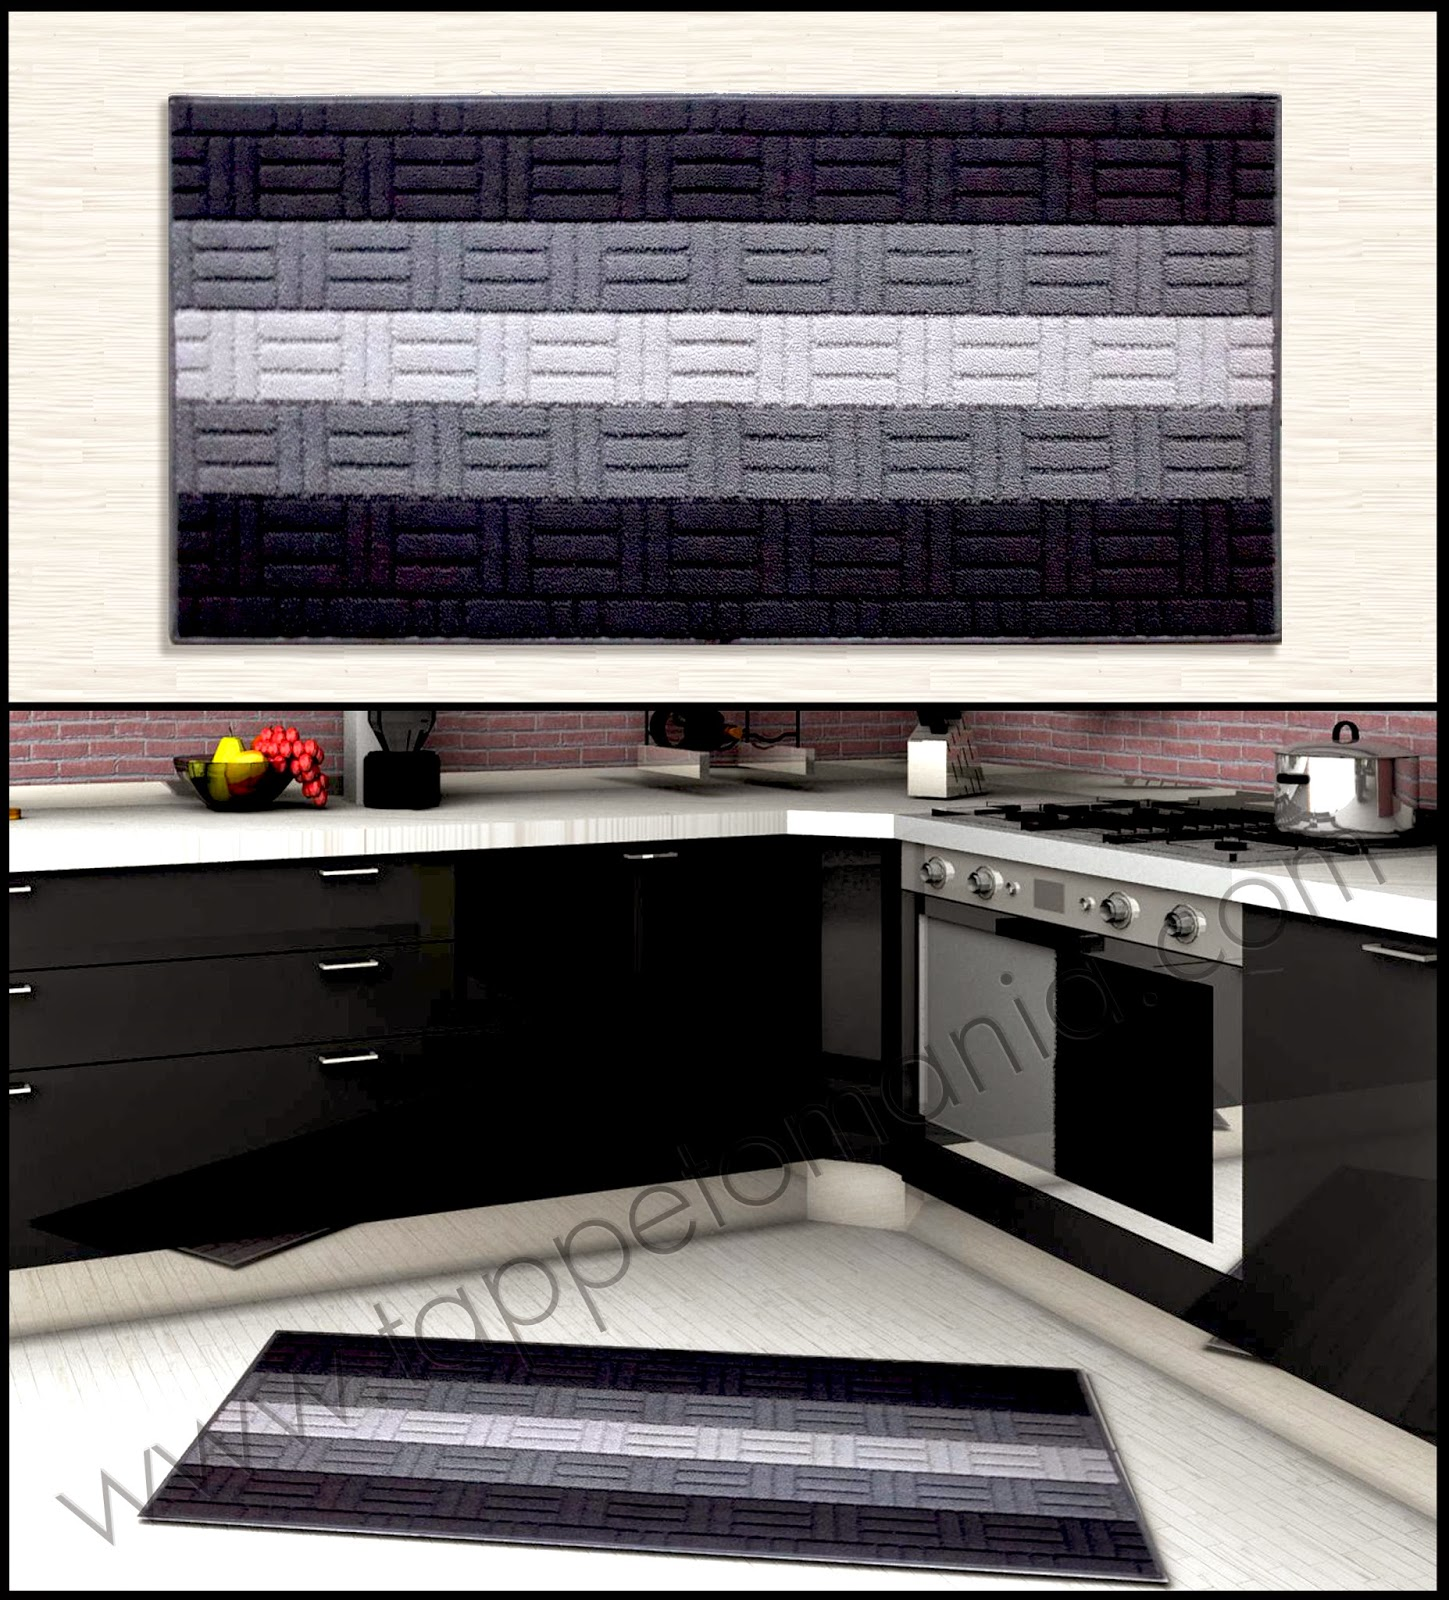 Stuoie per cucina tappeti passatoie tappeti bamboo for Tappeti casa classica